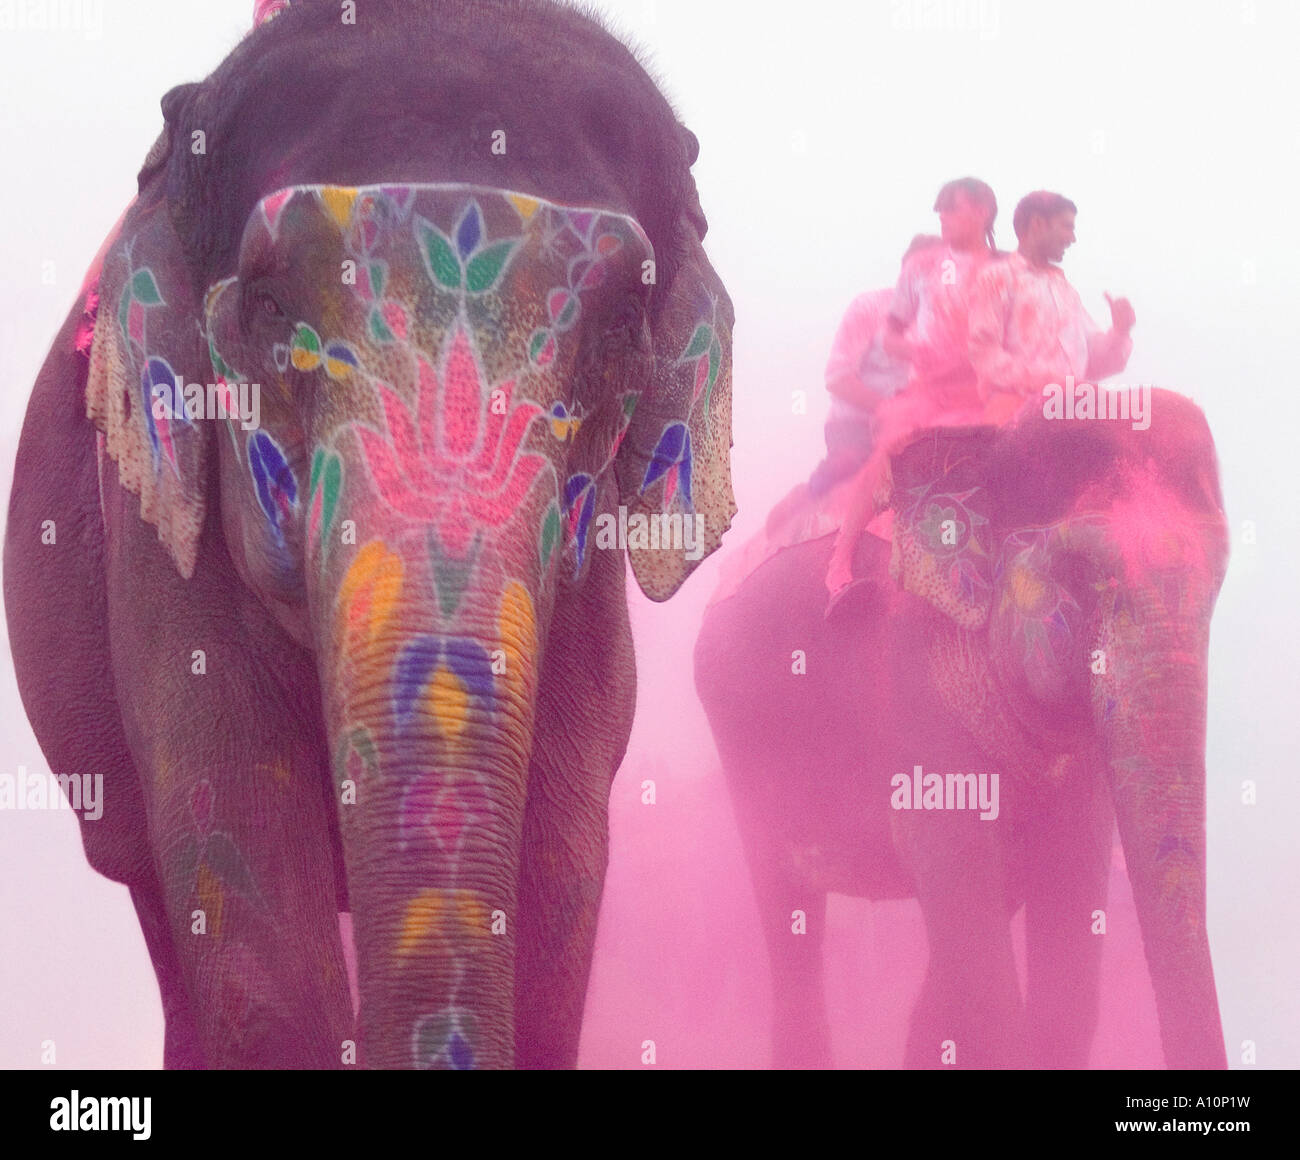 Tres elefantes en un festival de elefantes, Jaipur, Rajasthan, India Foto de stock